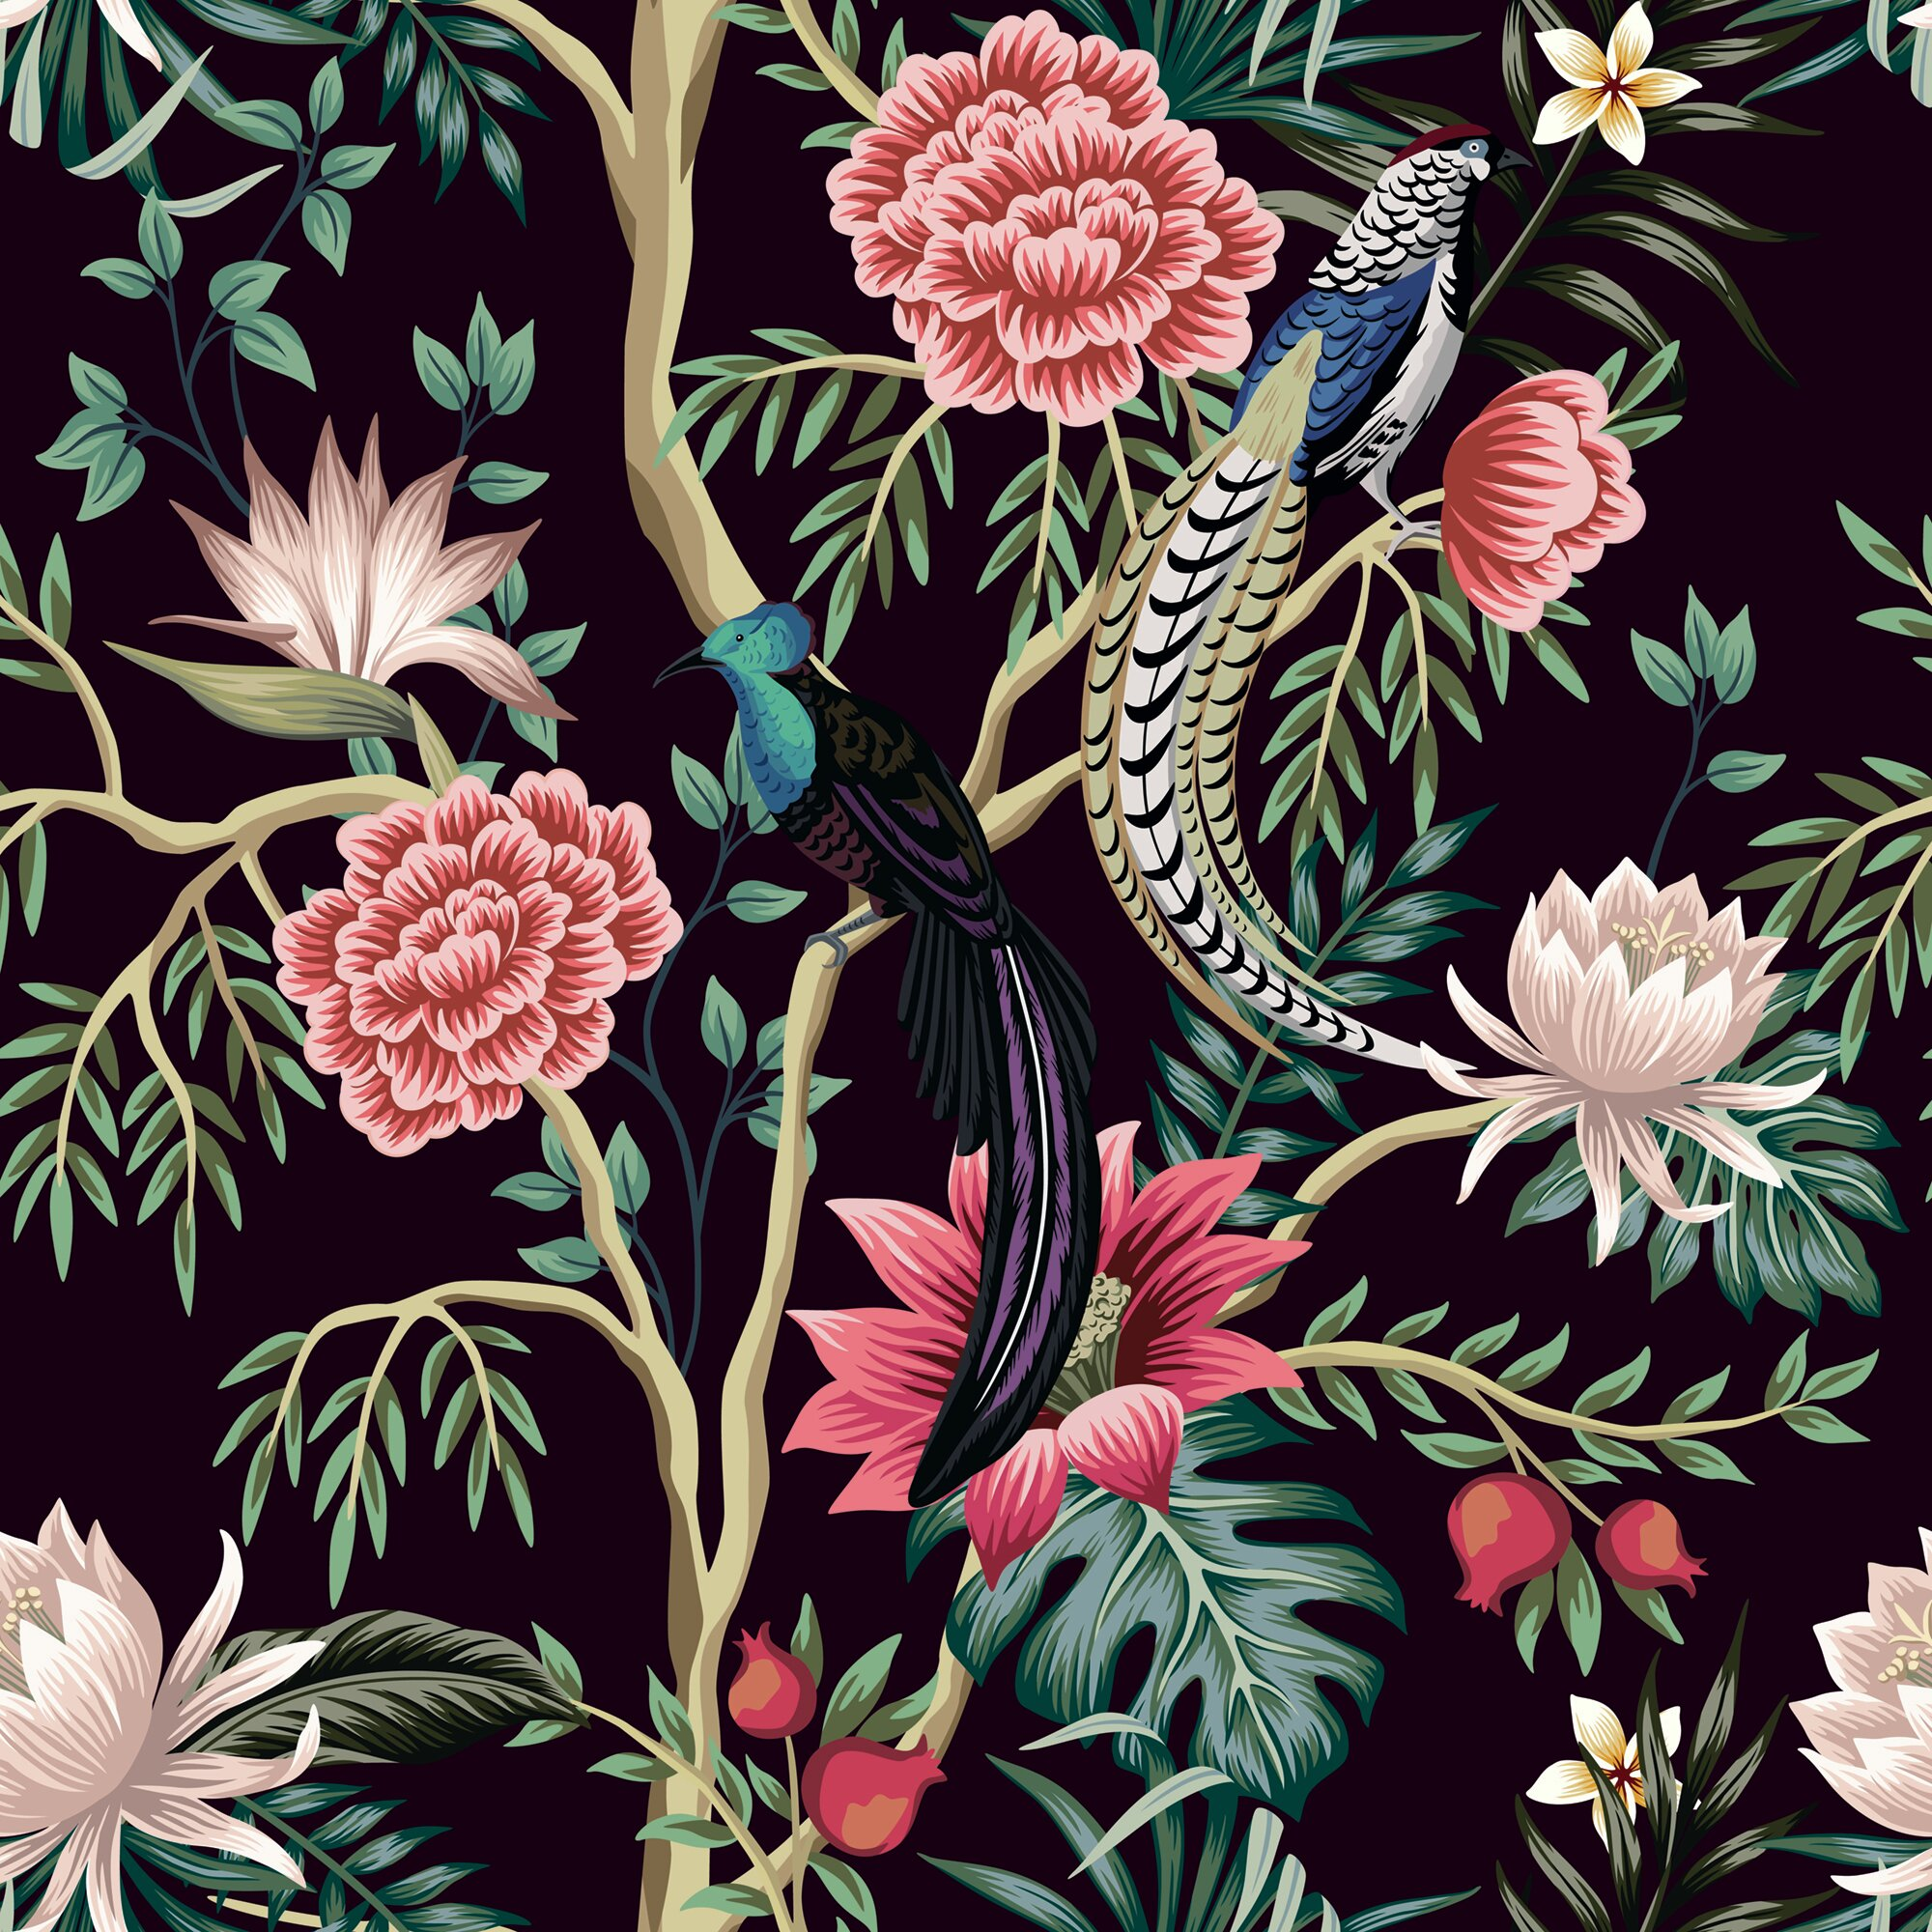 World Menagerie Garden Tree 10 L X 24 W Peel And Stick Wallpaper Roll Wayfair